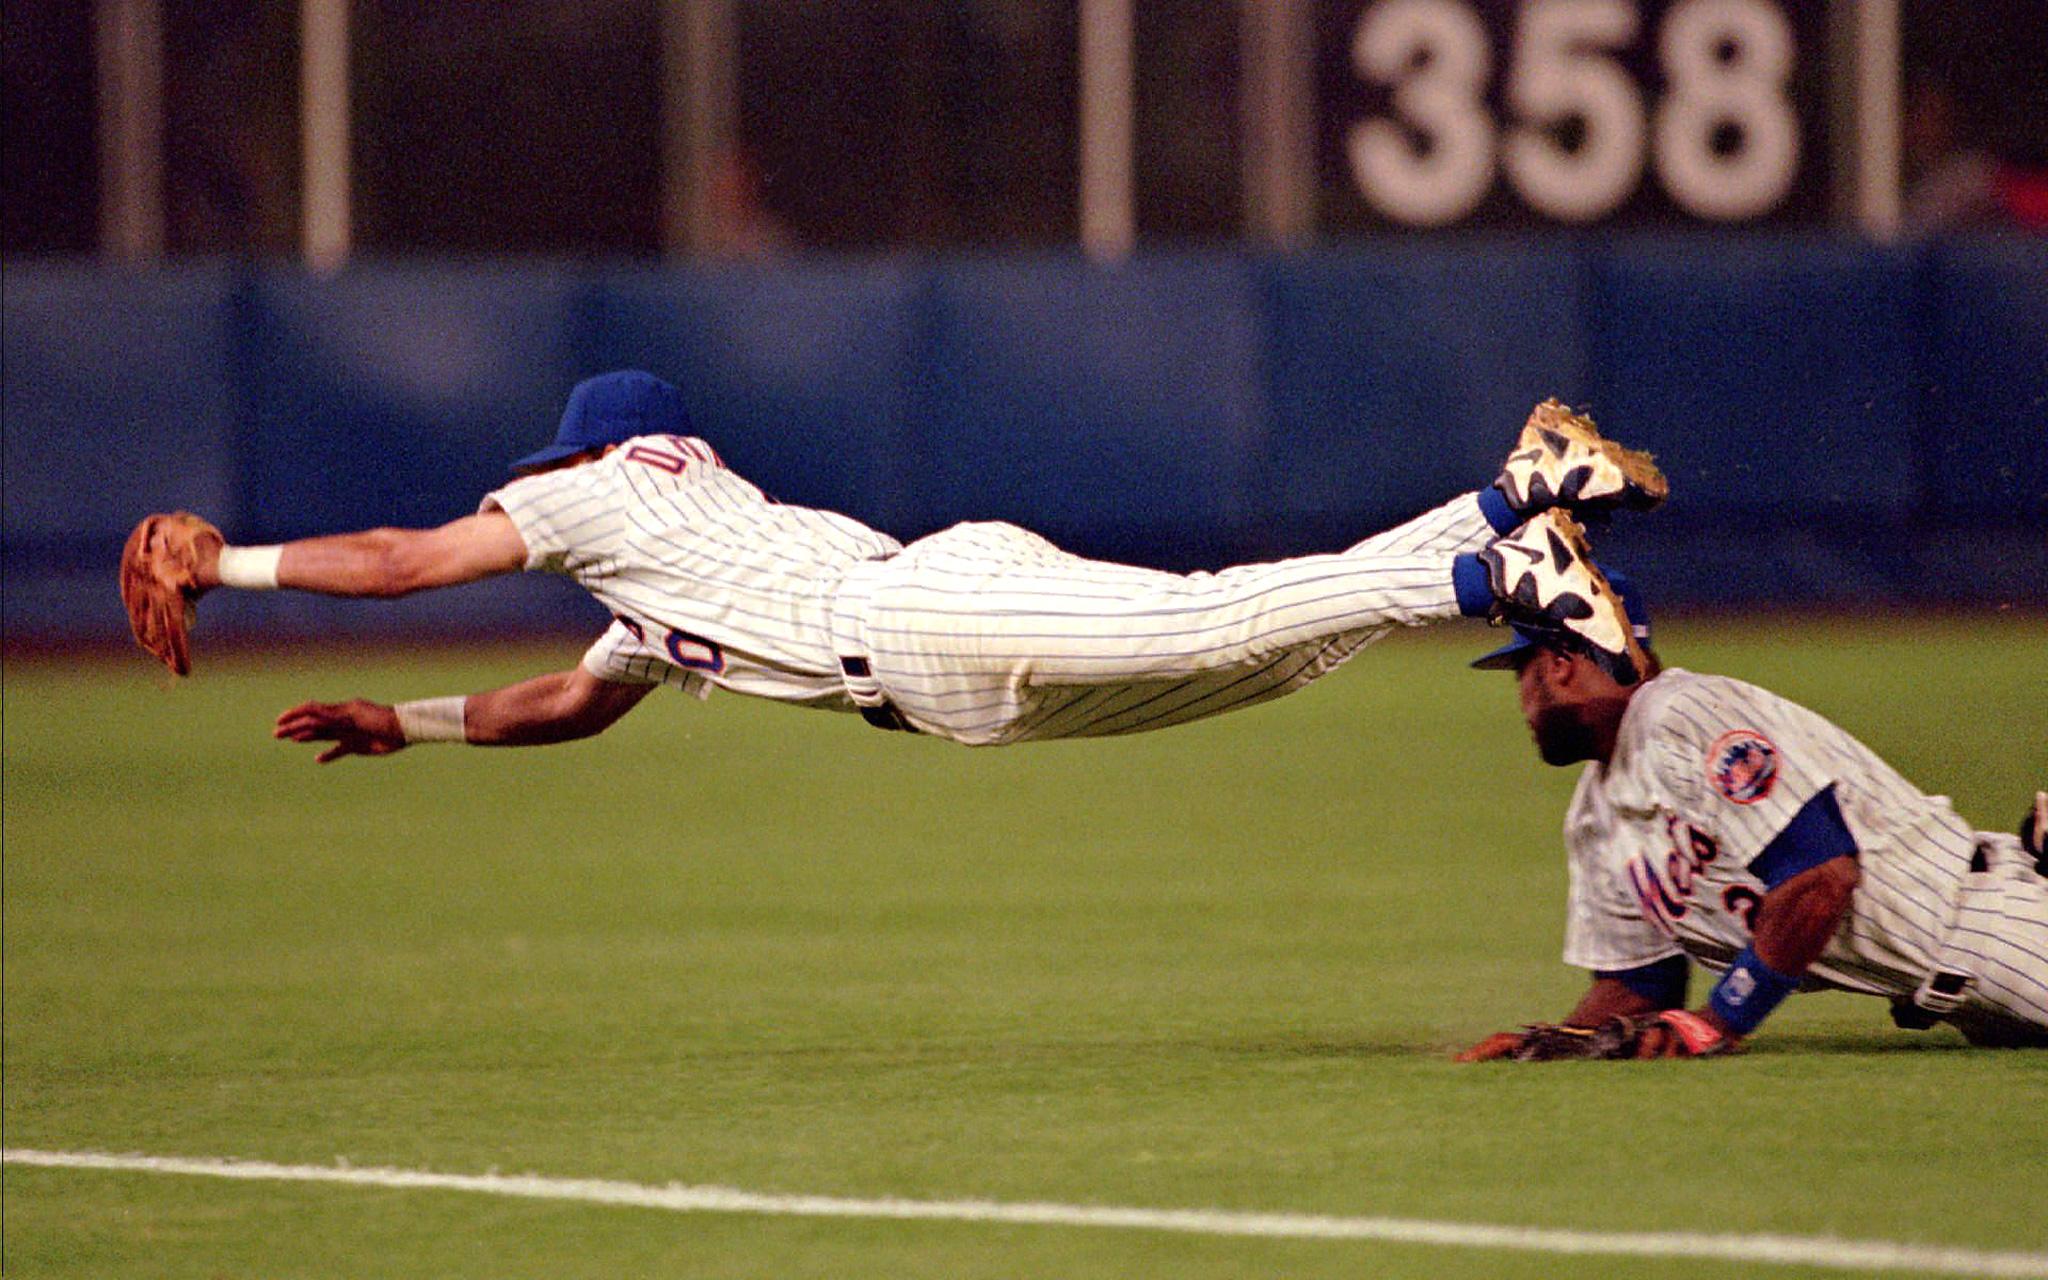 April 1st, 1996